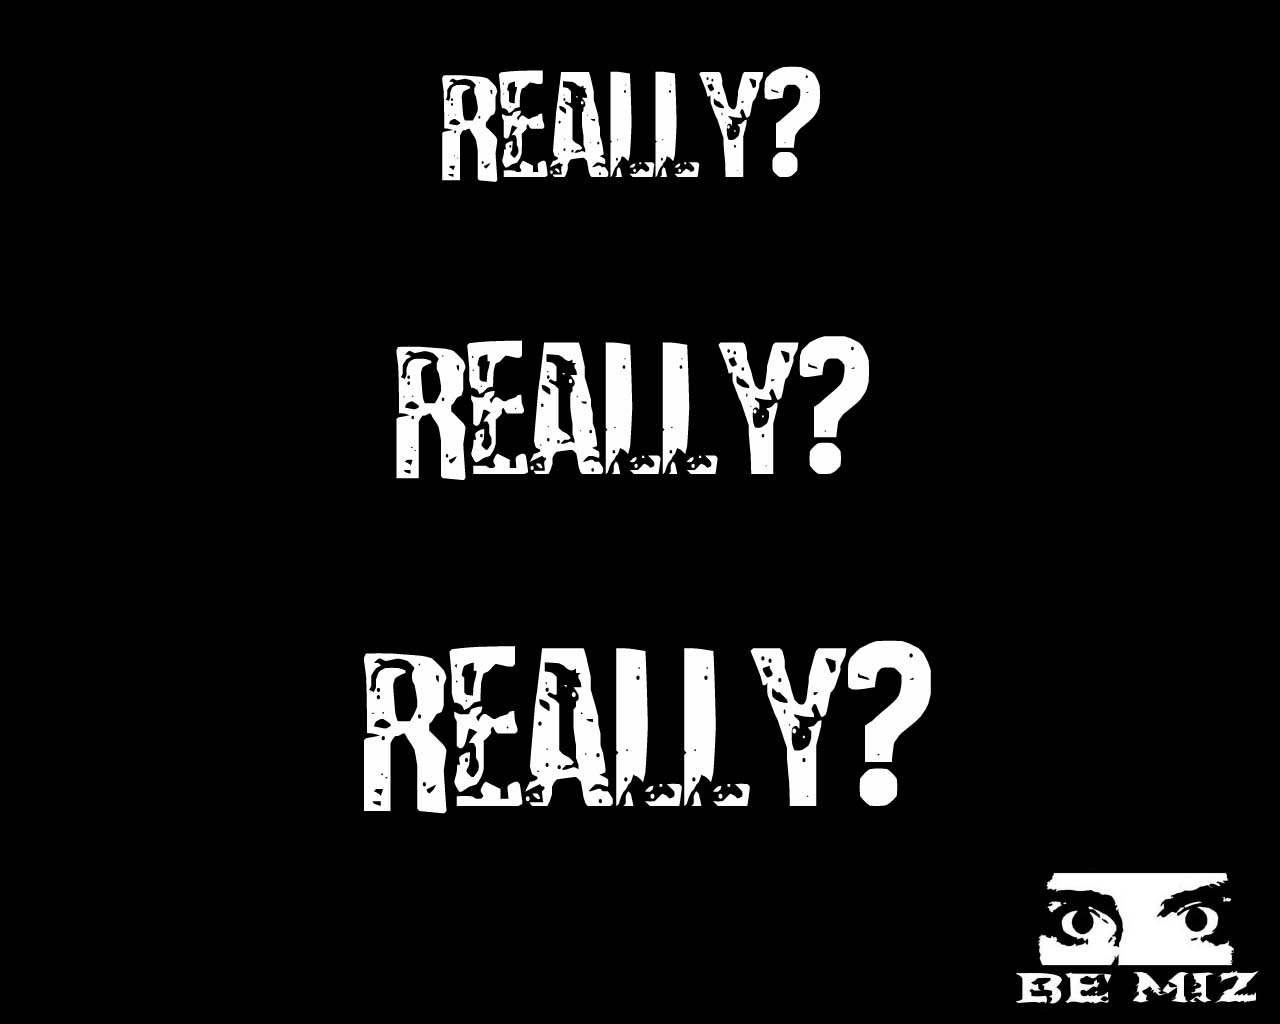 Really-wwe-25489536-1280-1024